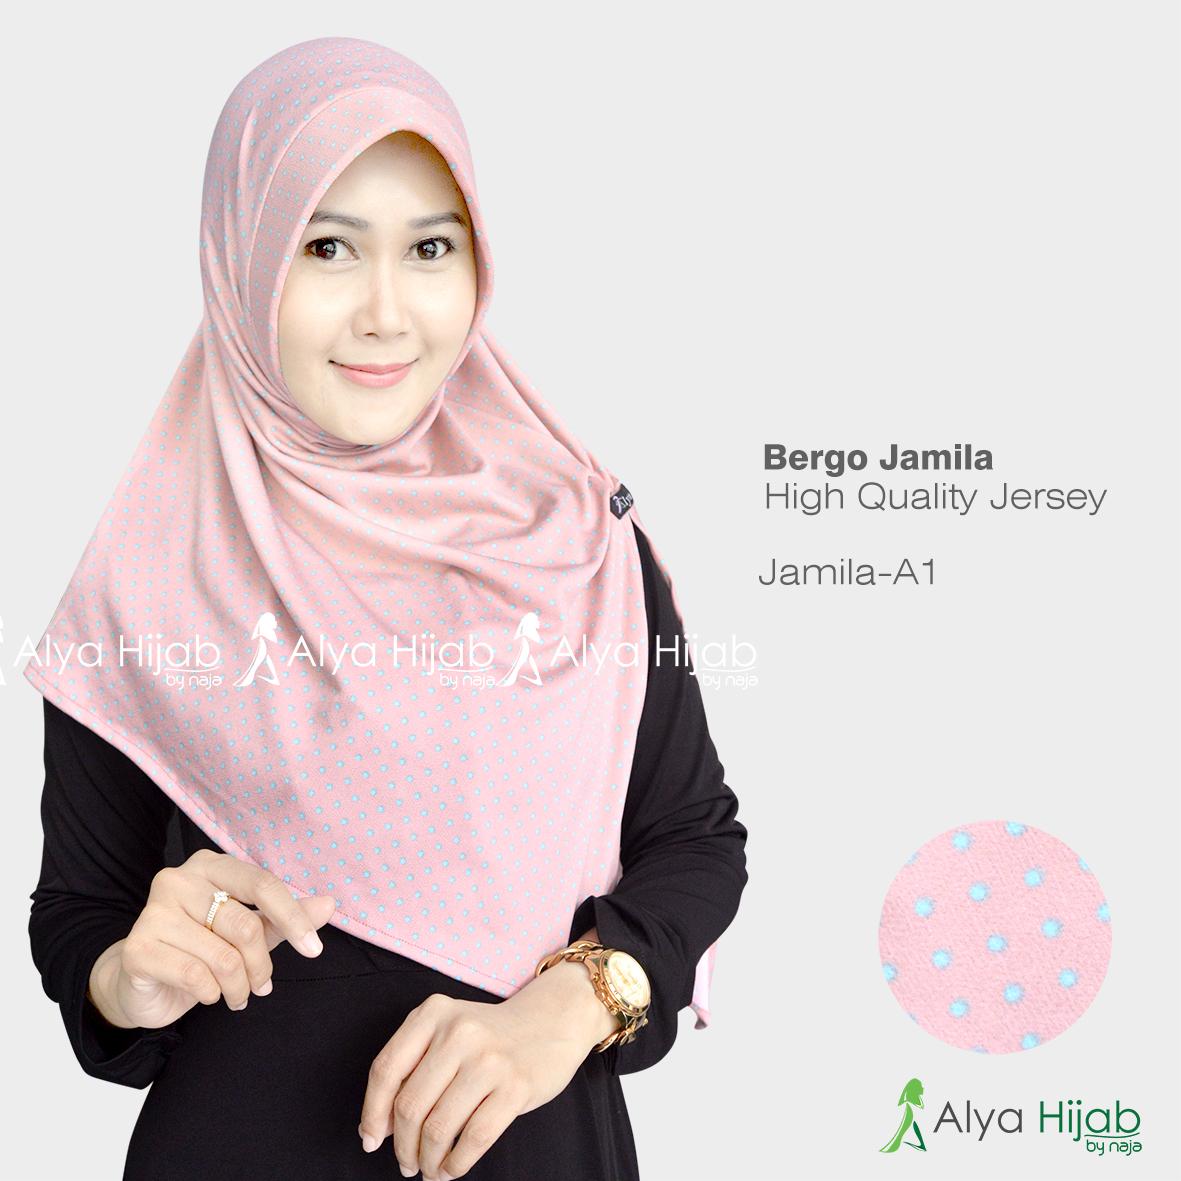 Hijab Bergo Jamila Alya Hijab By Naja Jual Hijab Dan Produsen